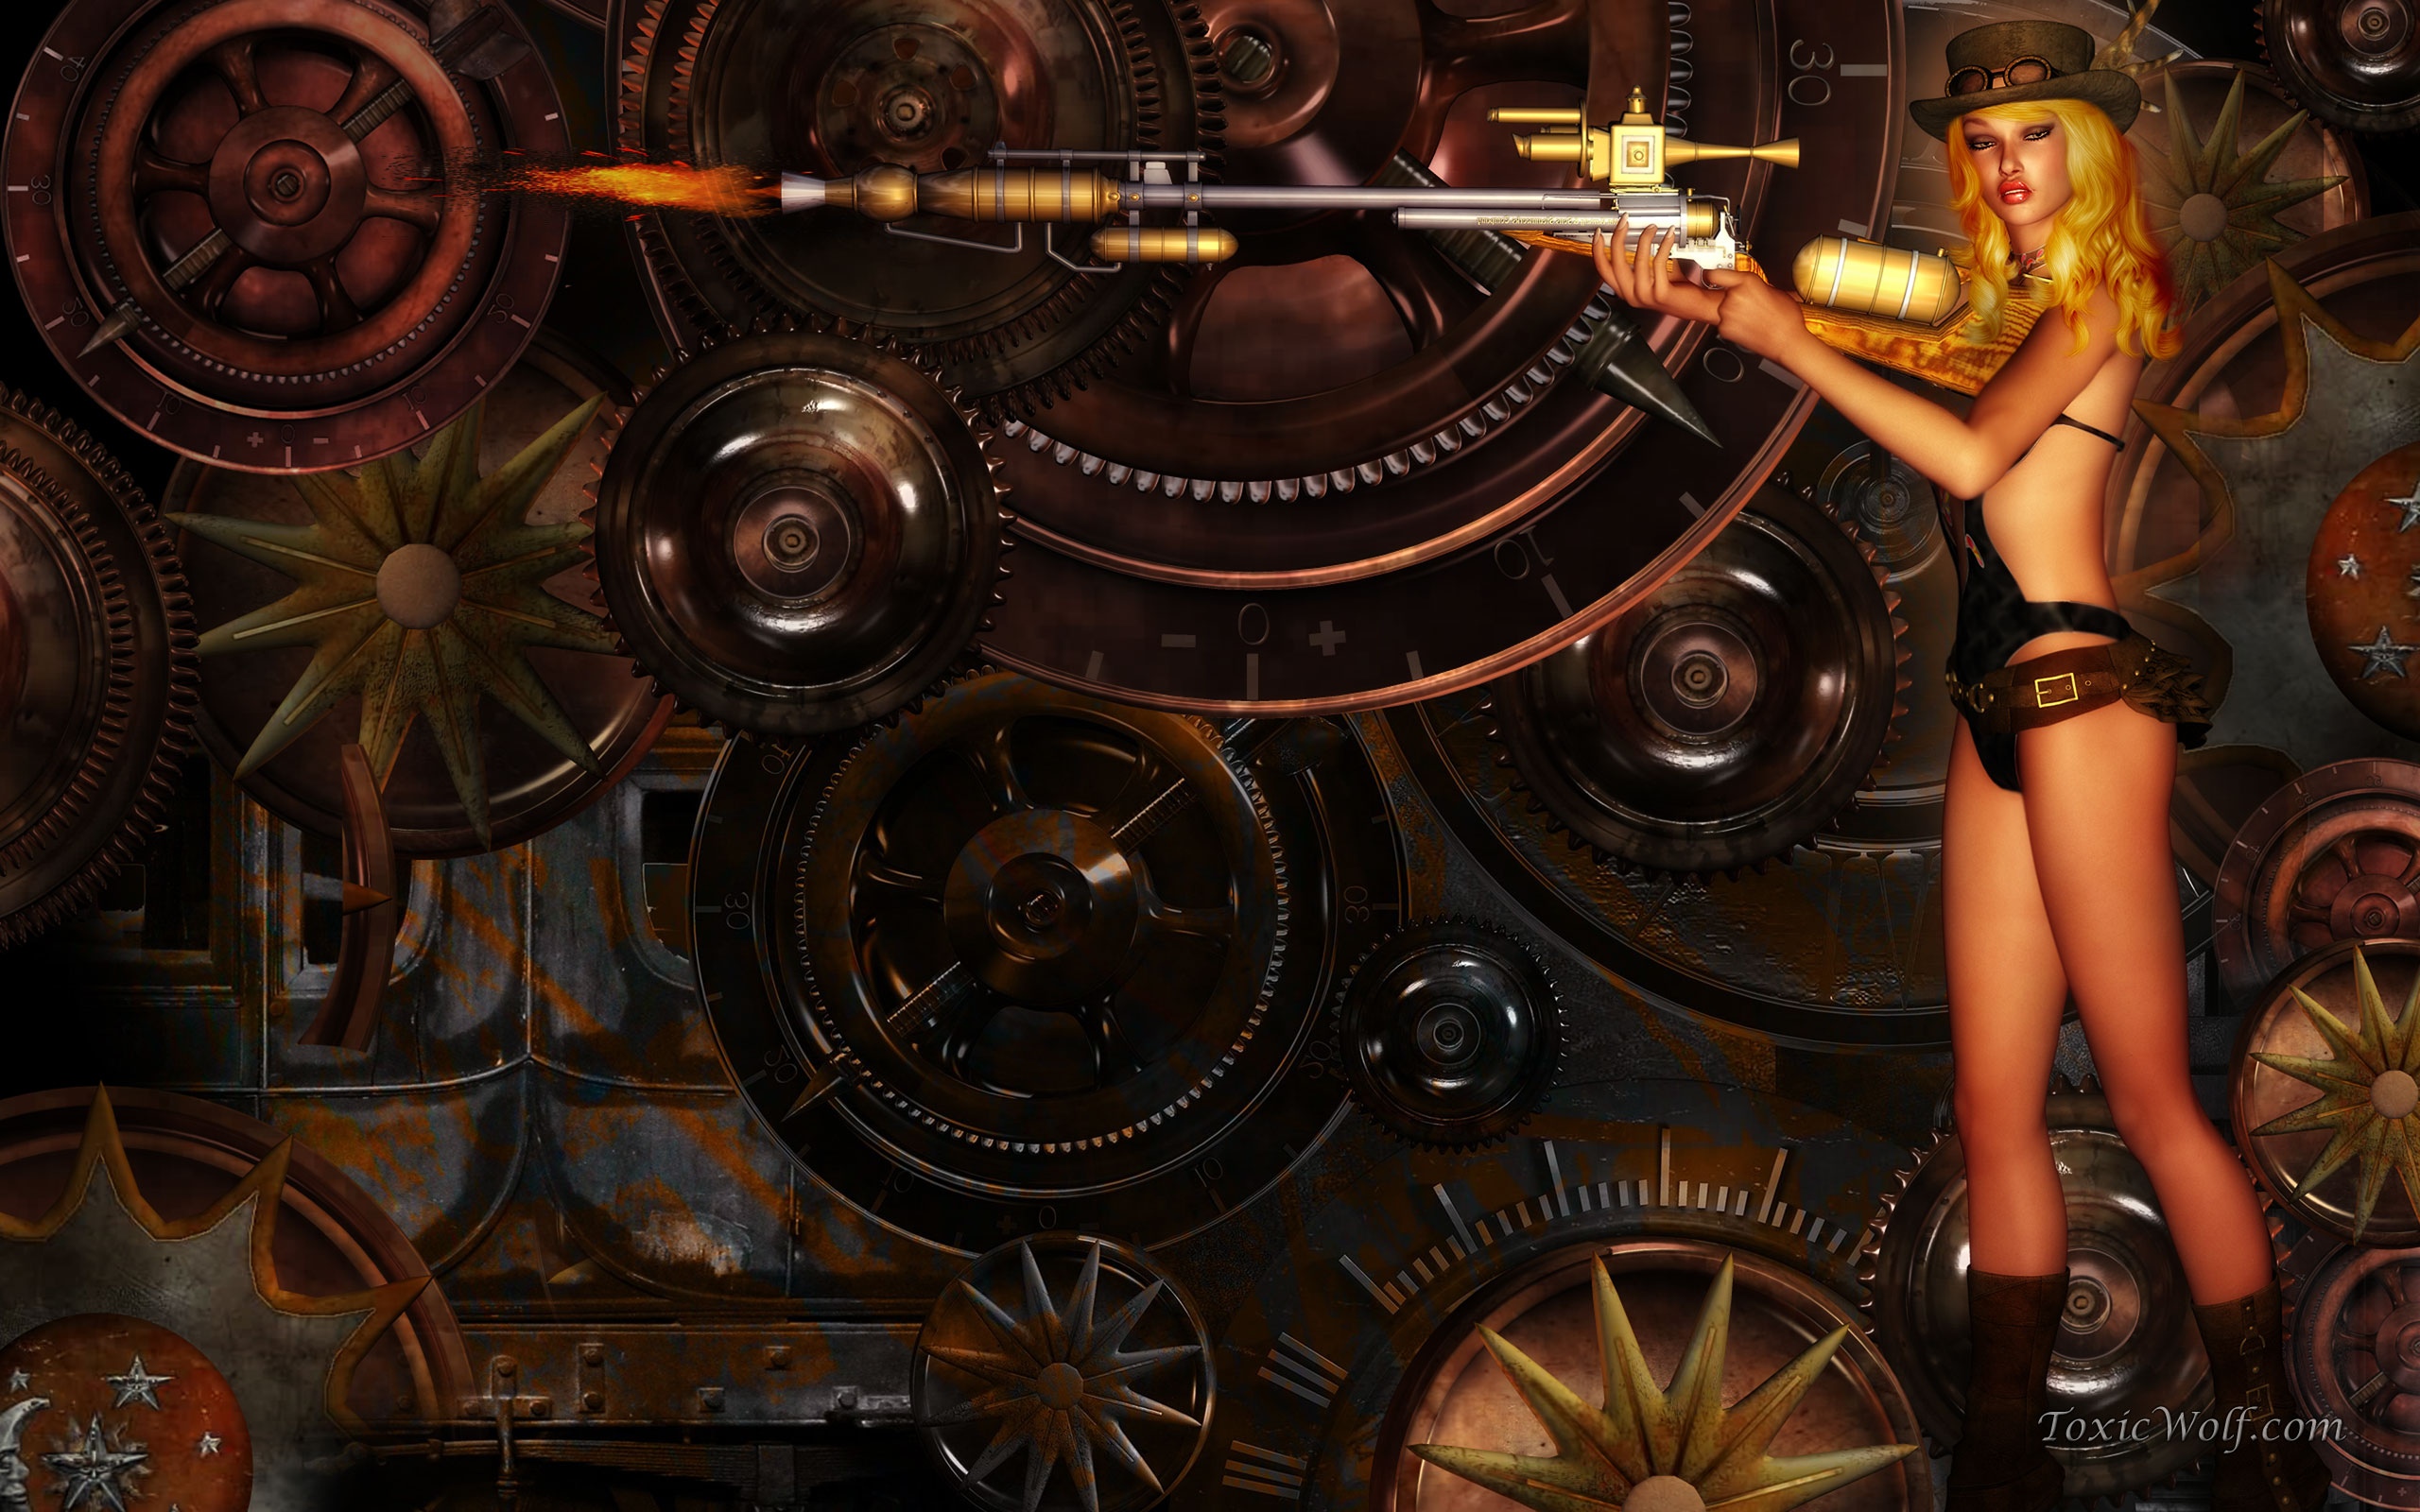 Steampunk Computer Wallpapers Desktop Backgrounds 2560x1600 ID 2560x1600